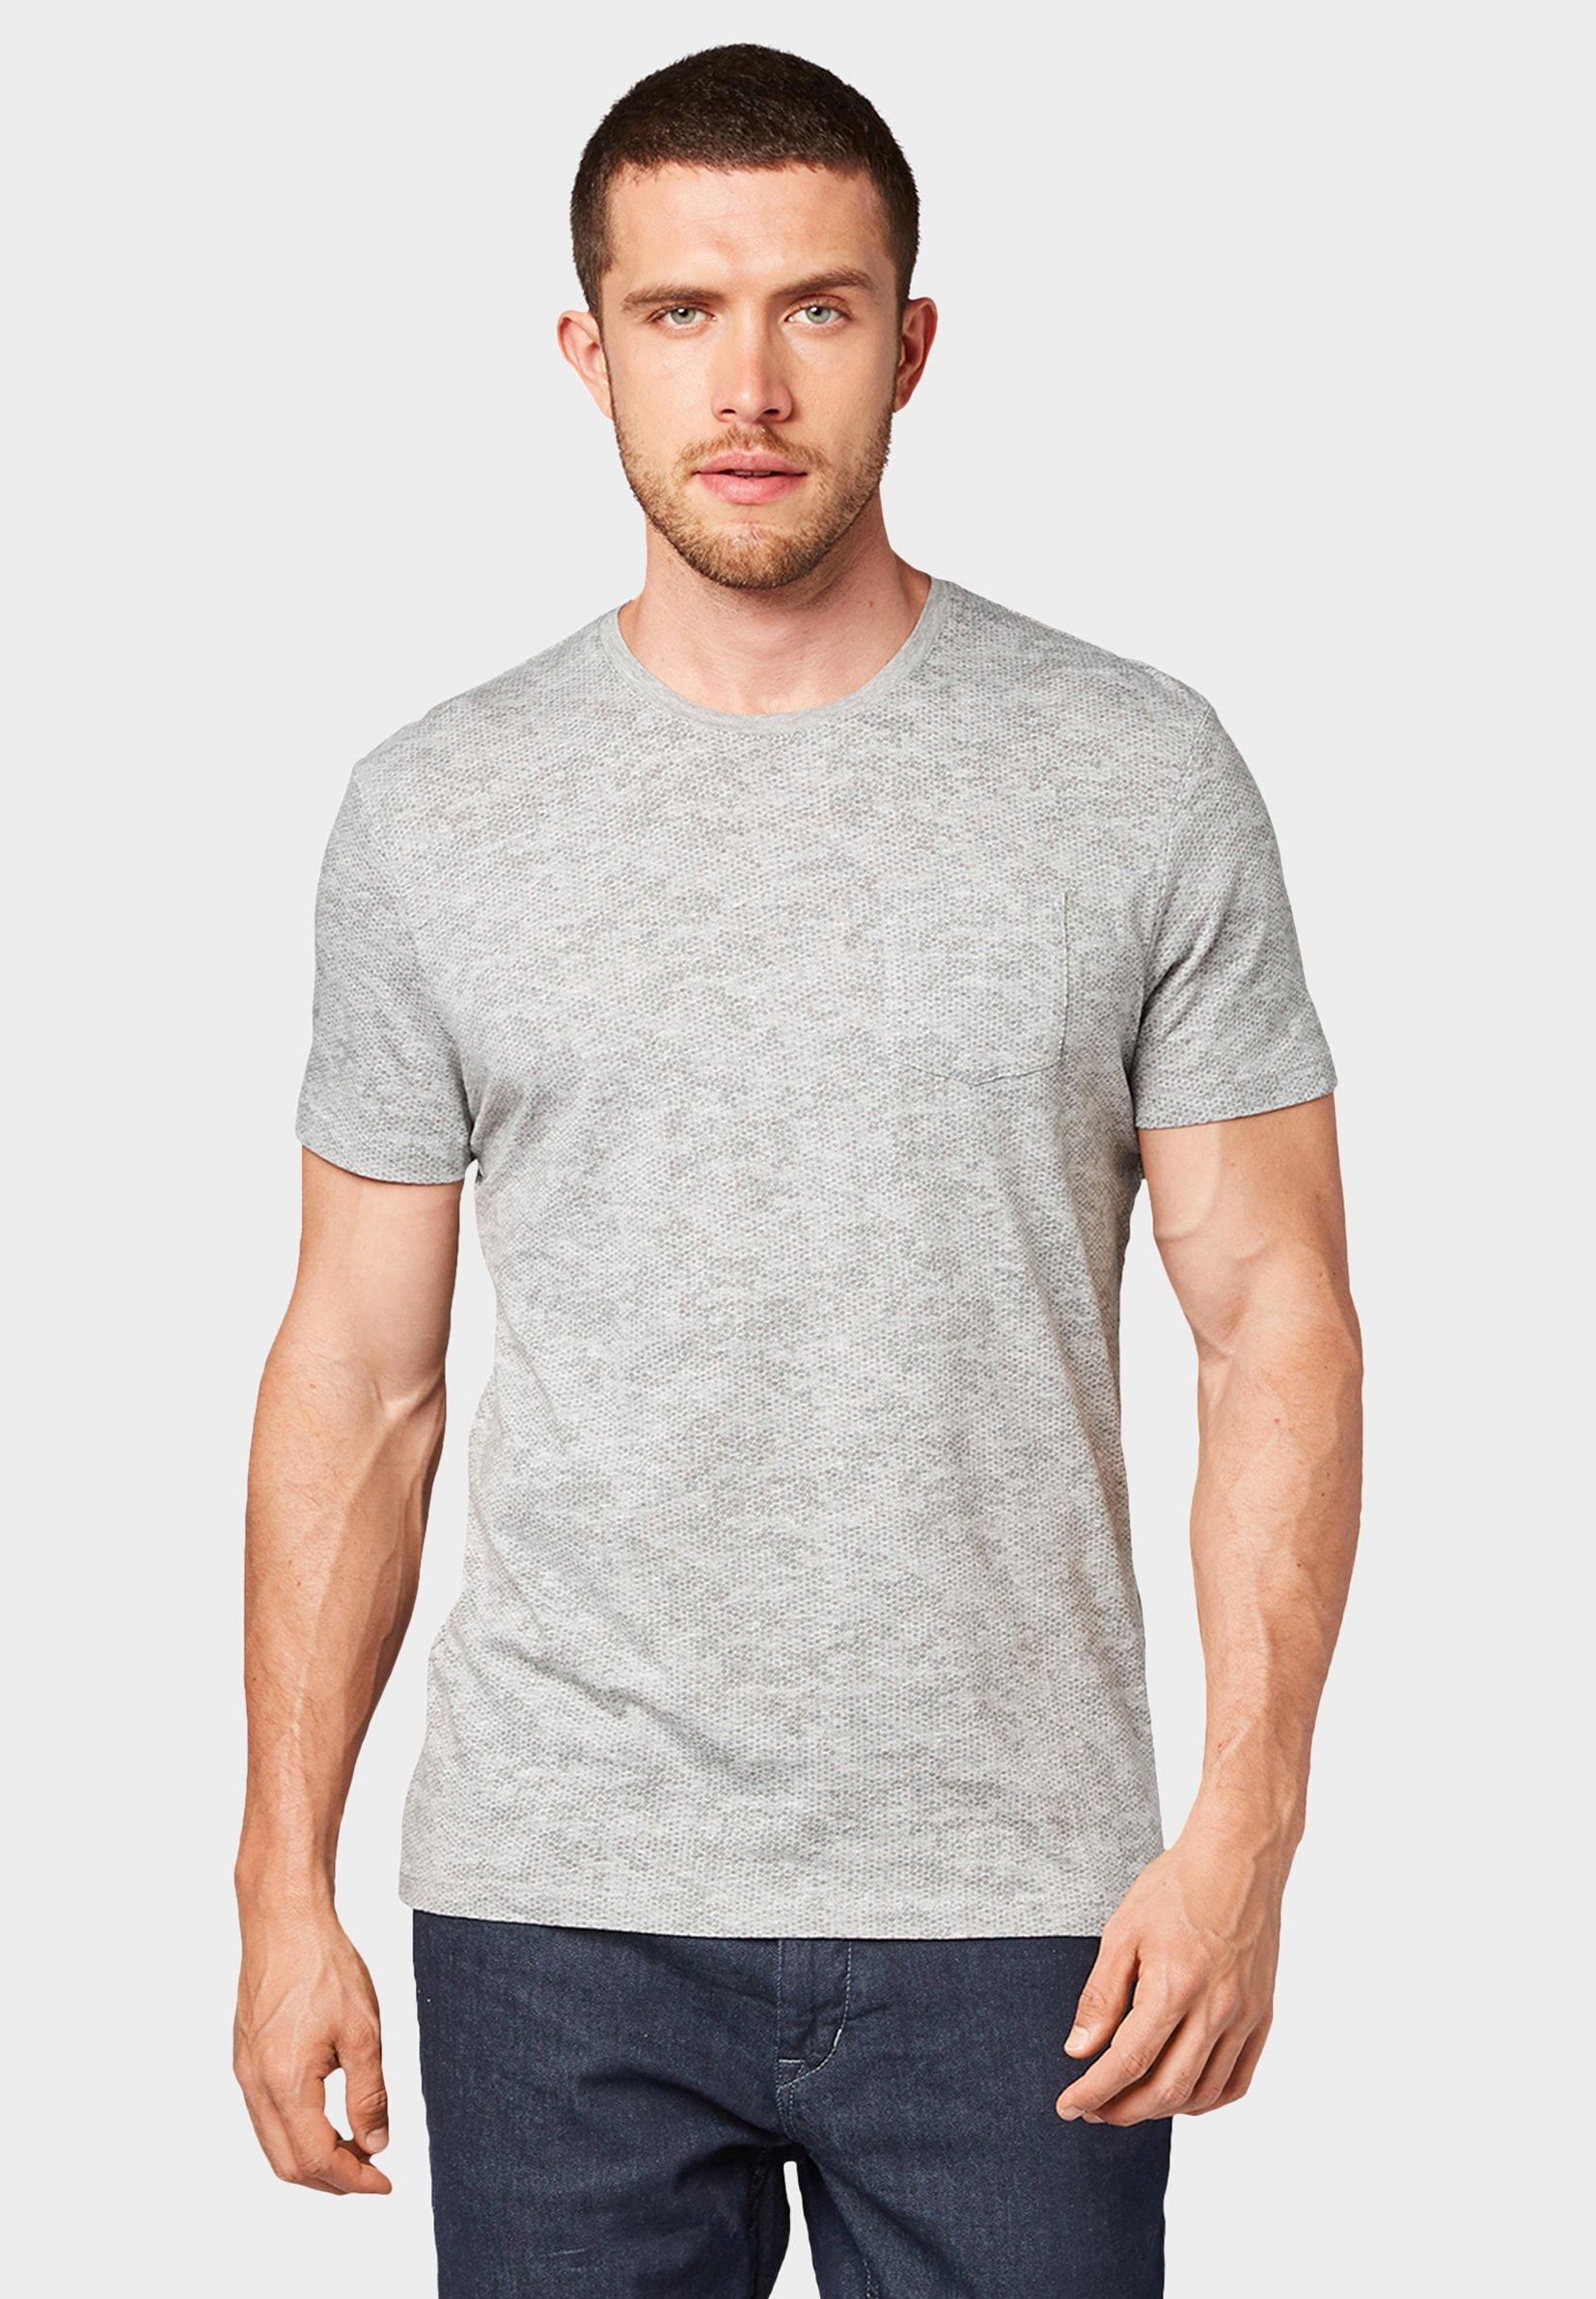 Imprimé Printed Tailor TeeT Allover Tom Gray shirt qpMSVUz